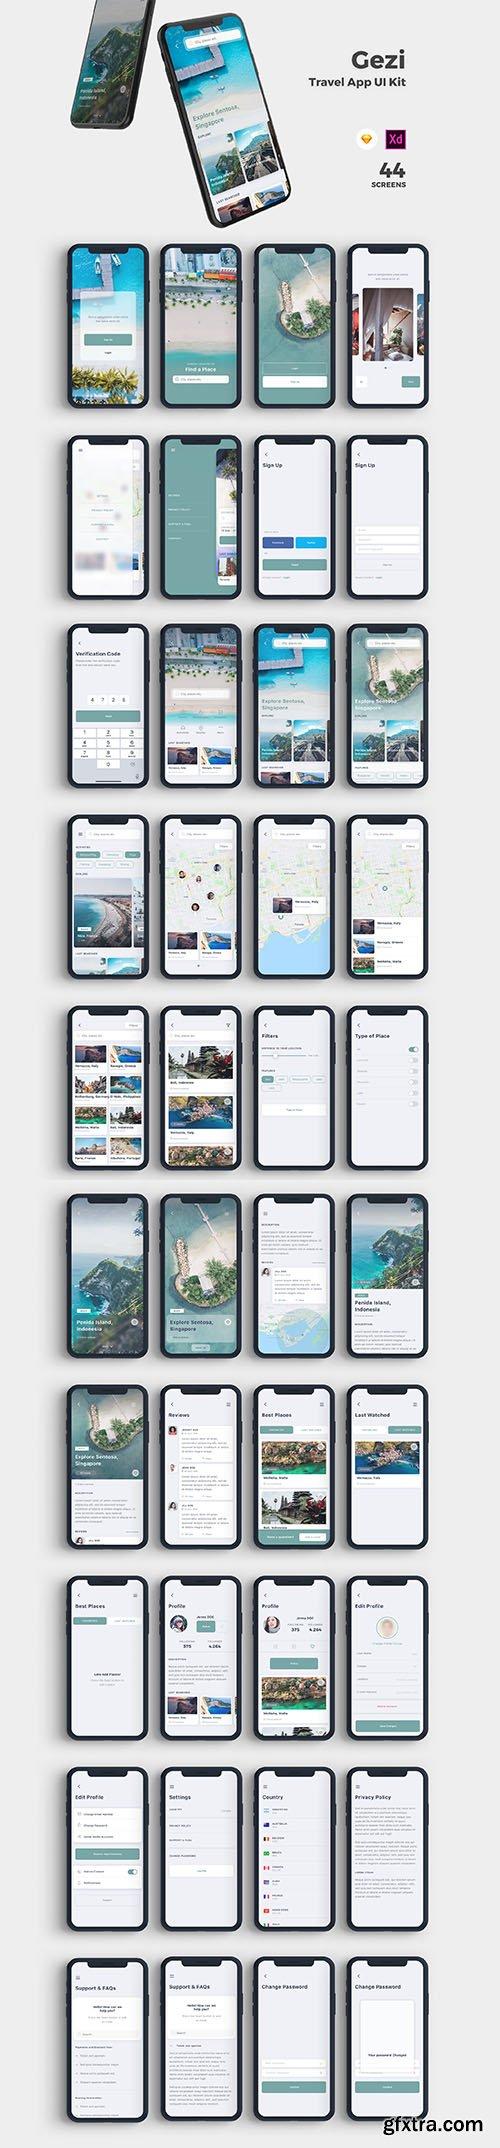 Gezi Travel App UI Kit